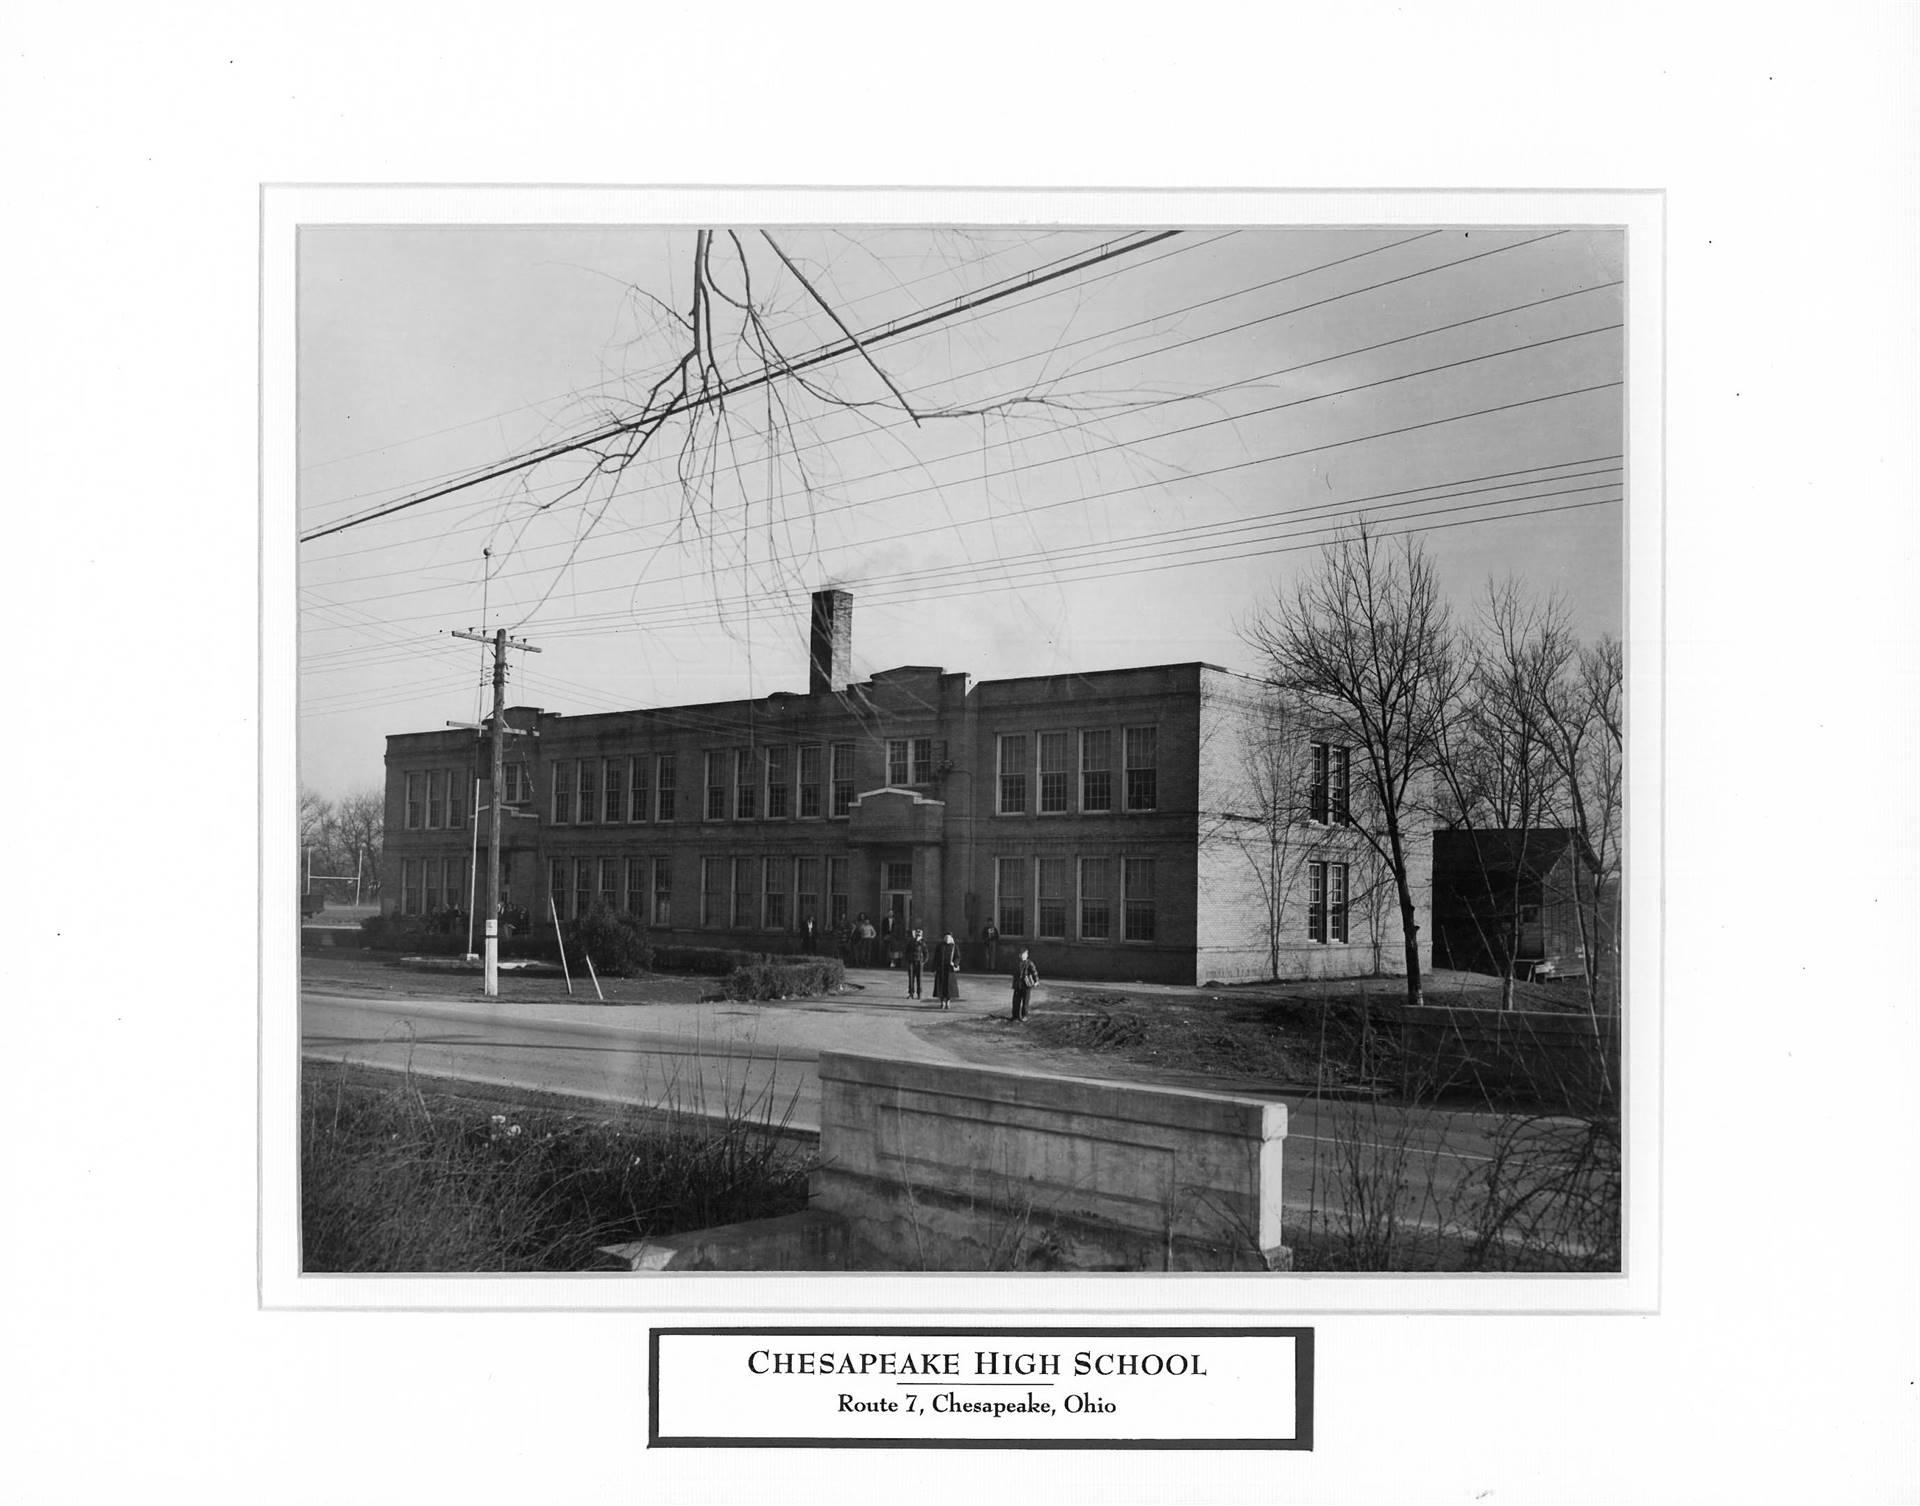 Chesapeake High School in 1925